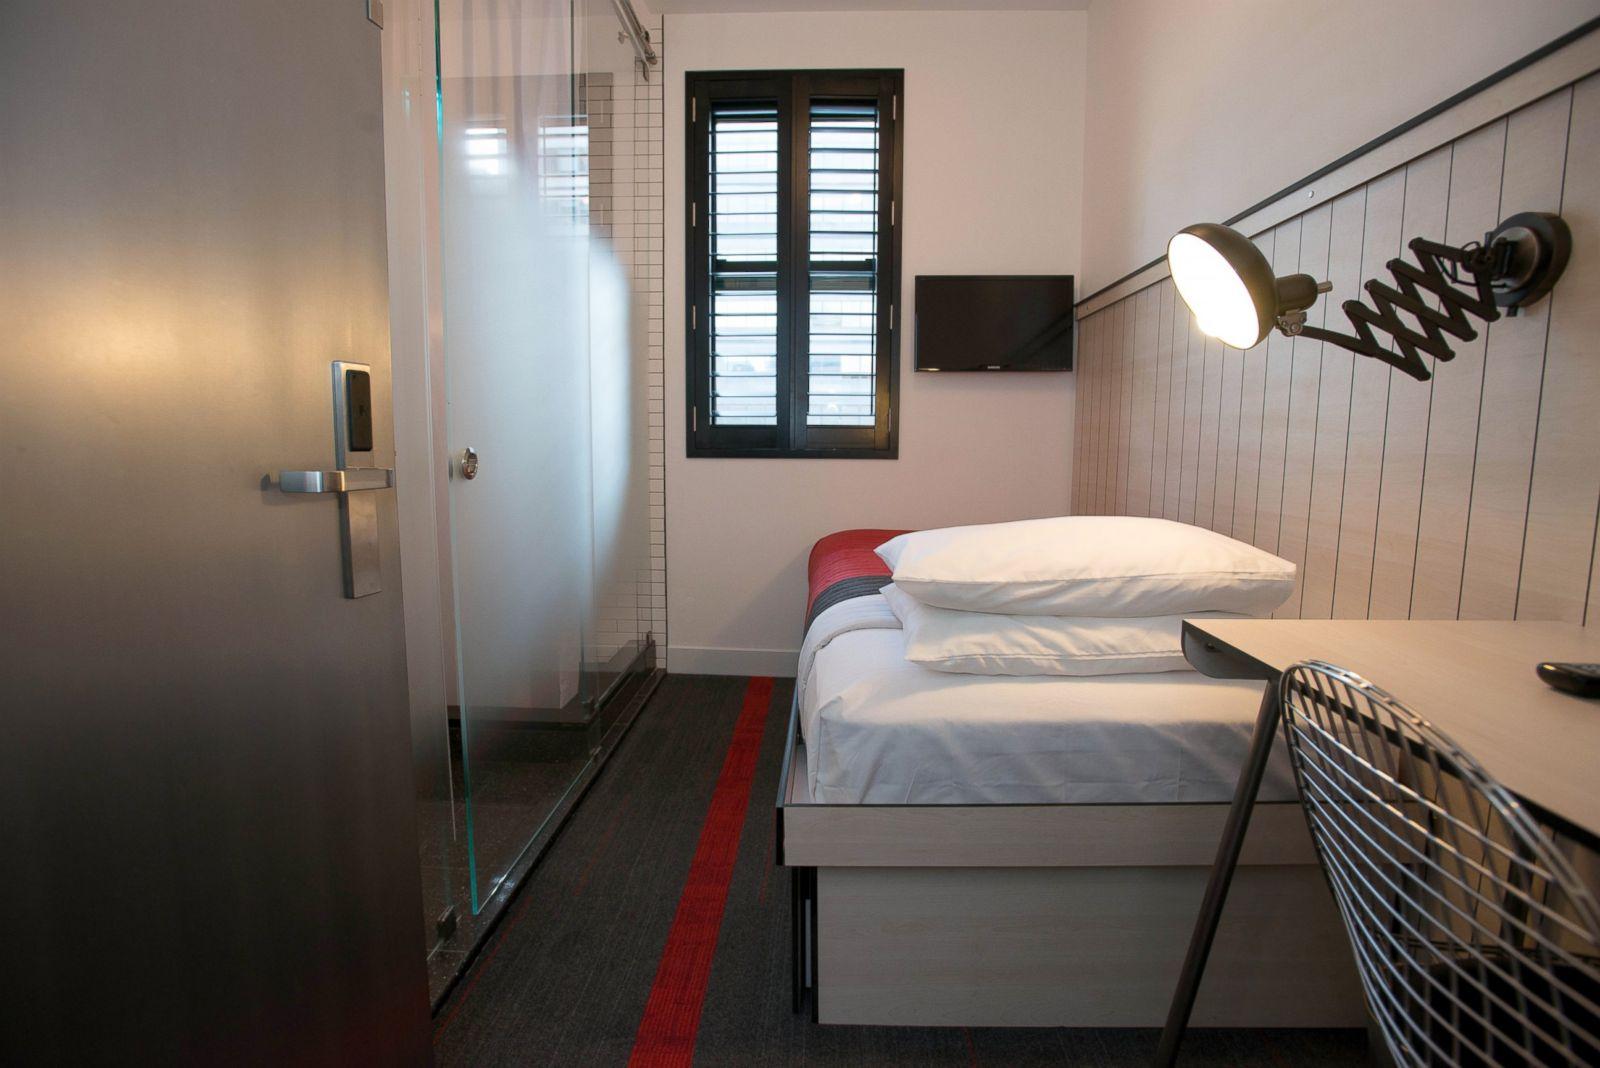 pod 39 new york city new york united states picture. Black Bedroom Furniture Sets. Home Design Ideas